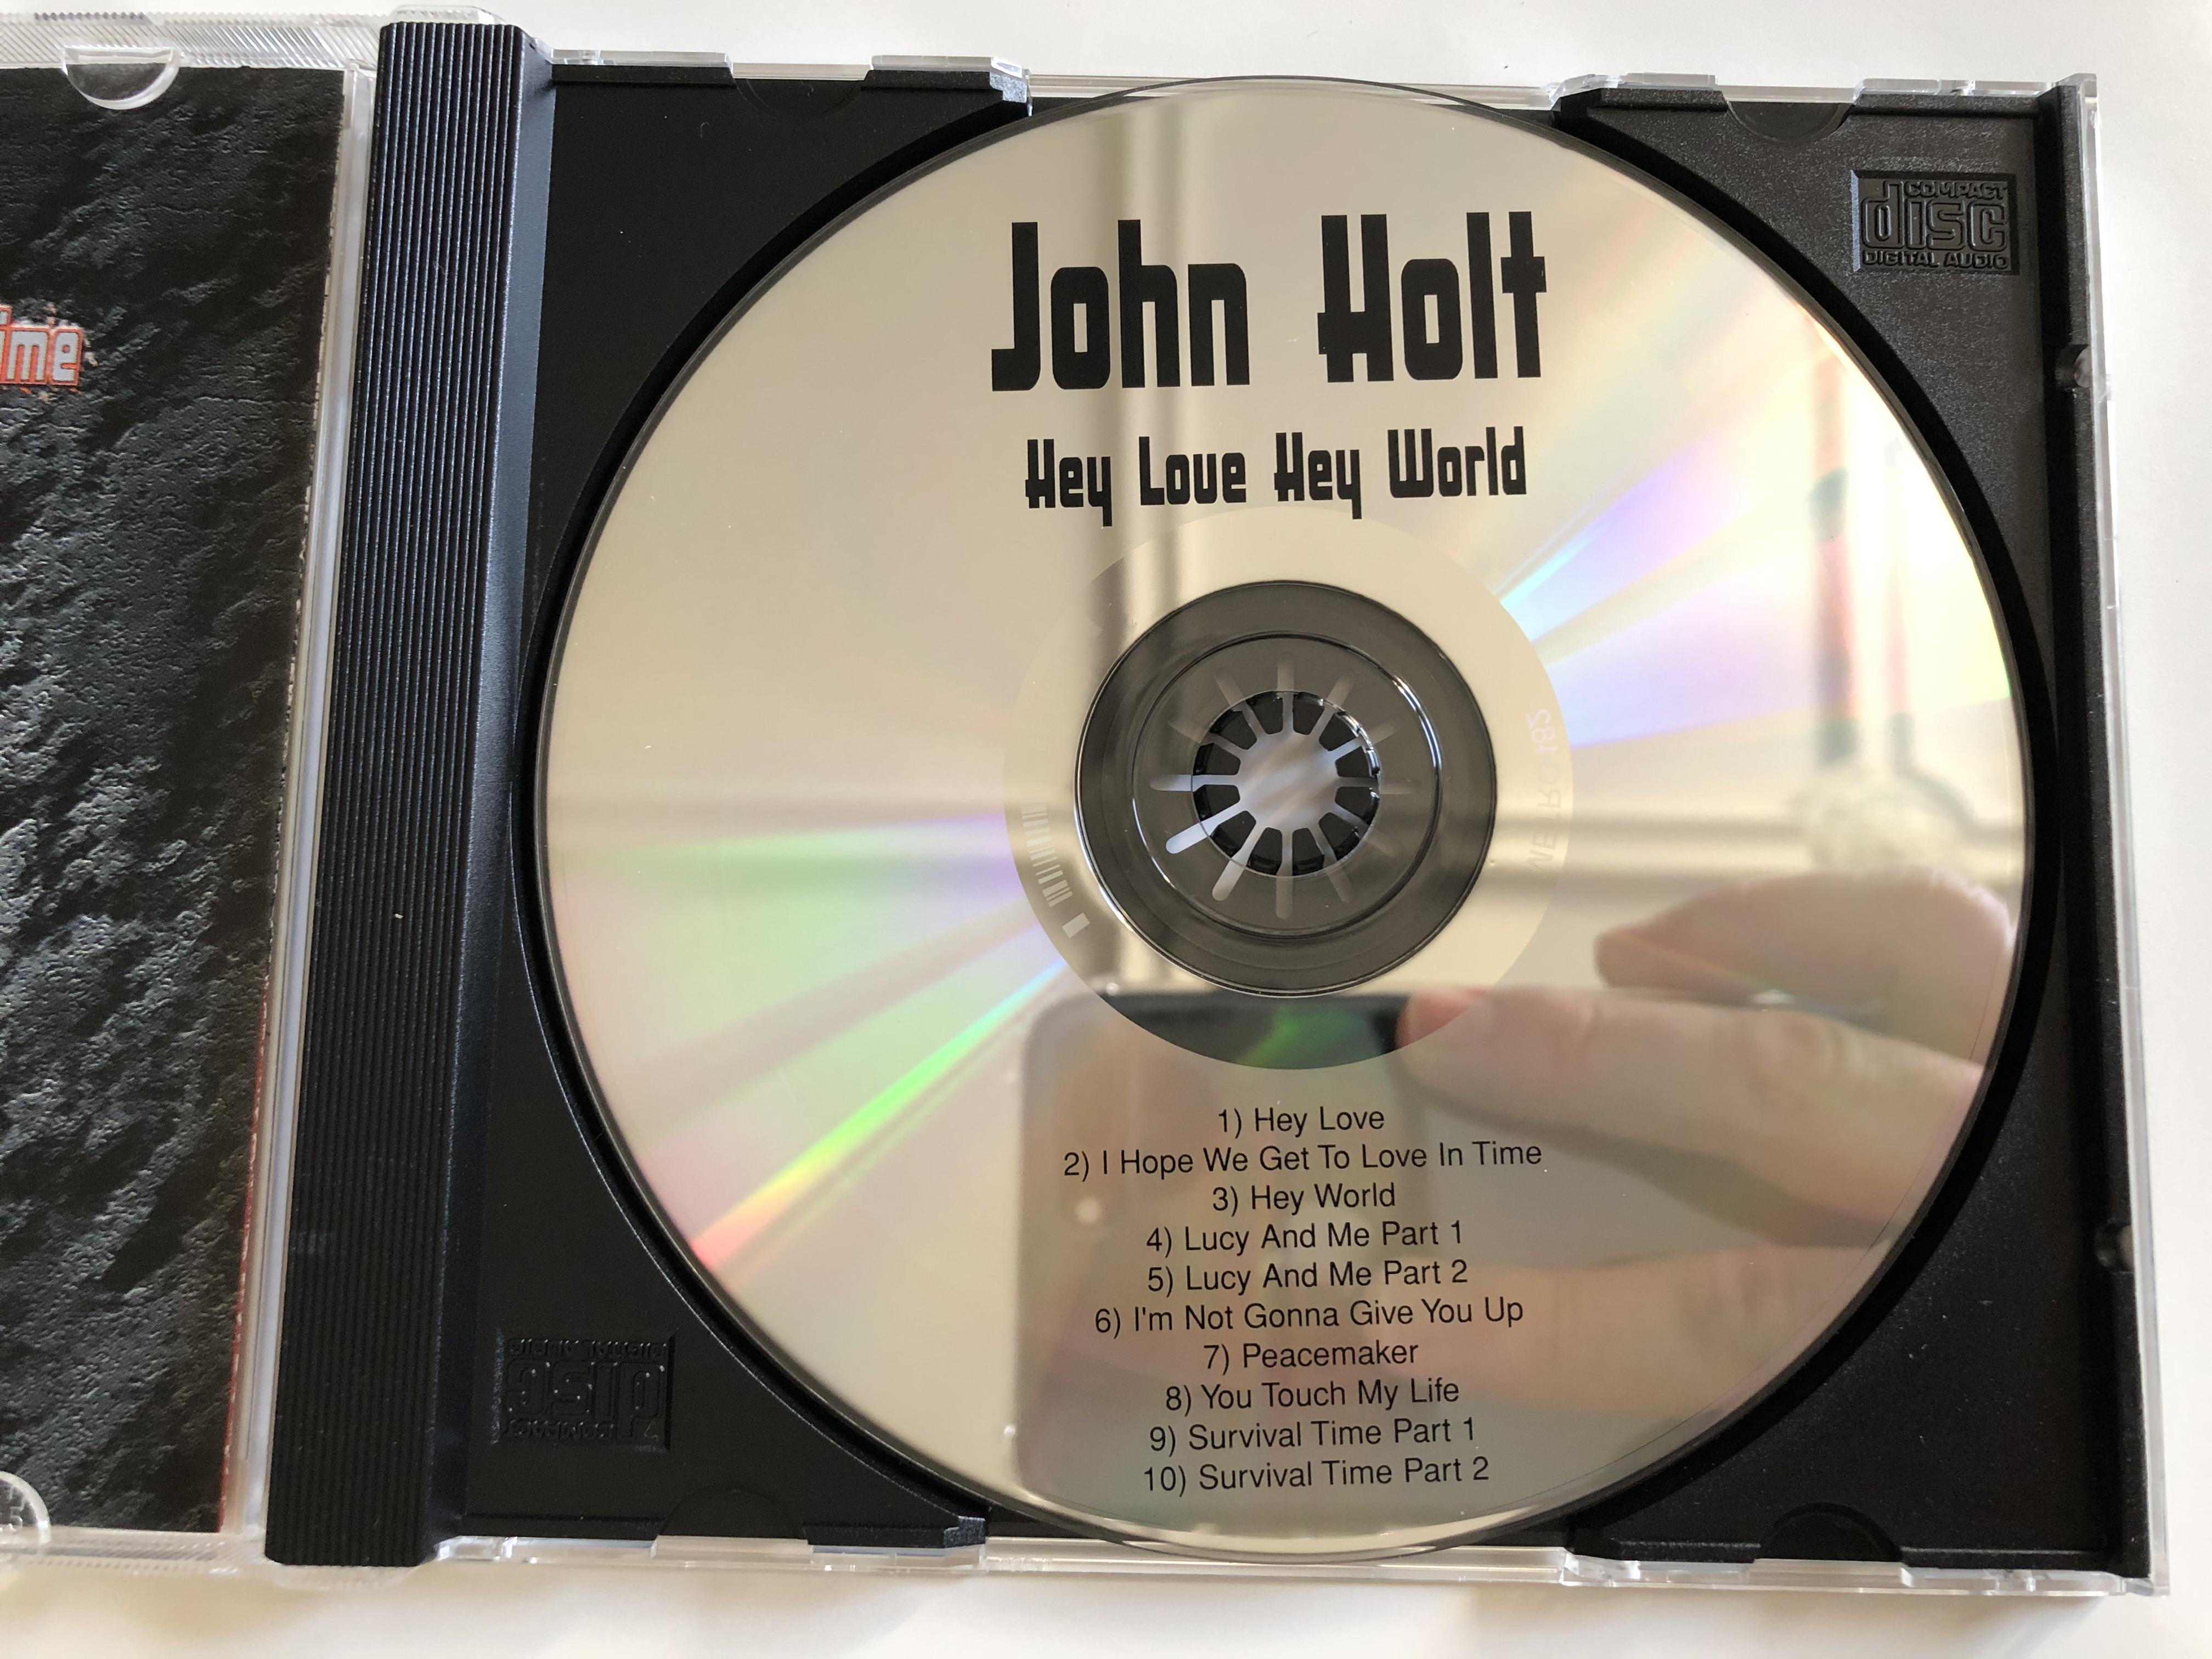 john-holt-hey-love-hey-world-dressed-to-kill-audio-cd-2000-metro482-3-.jpg